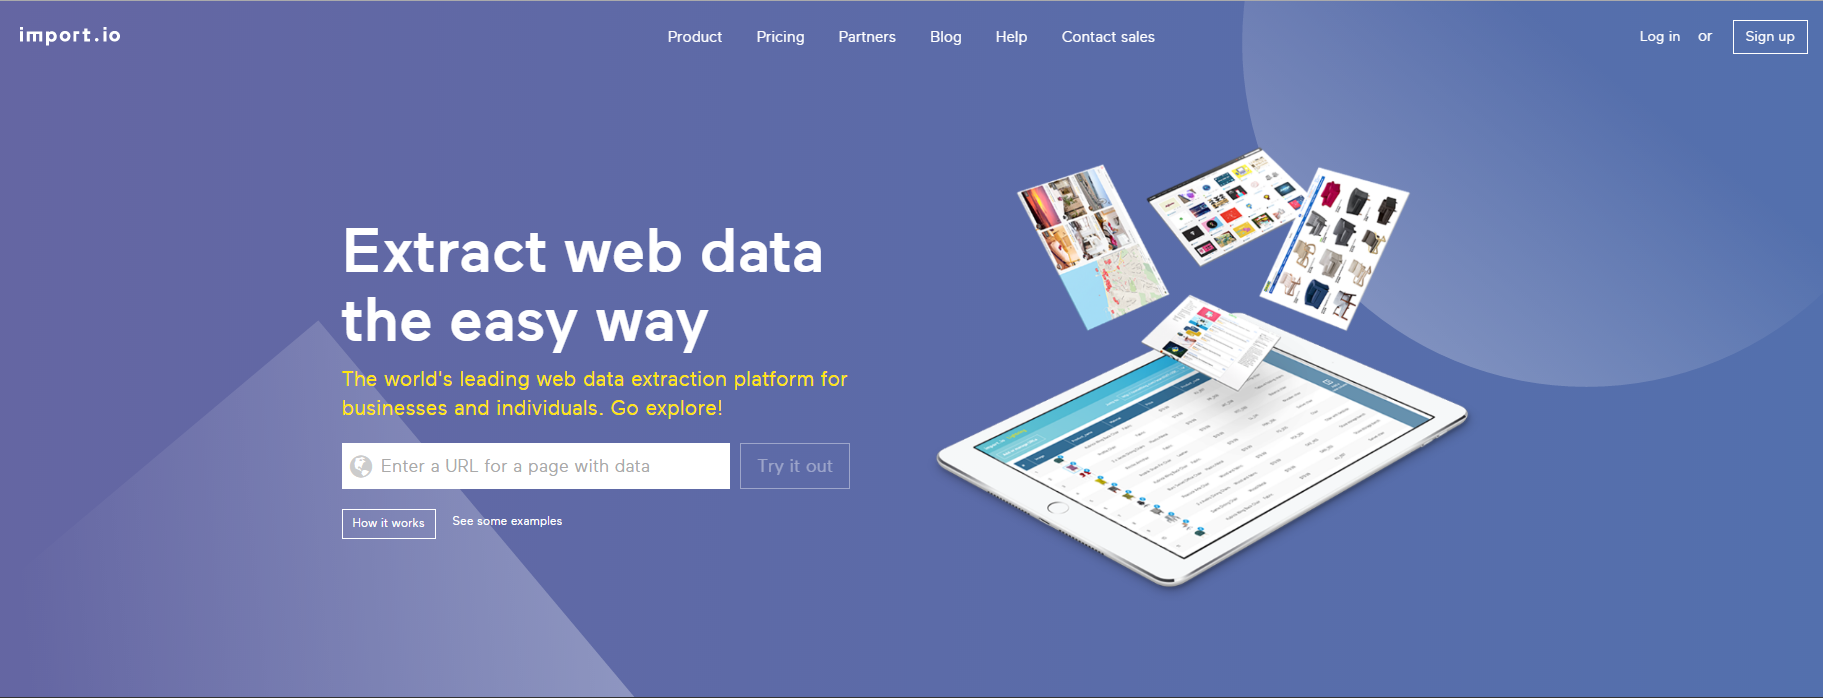 Web Scraping - Alteryx Community